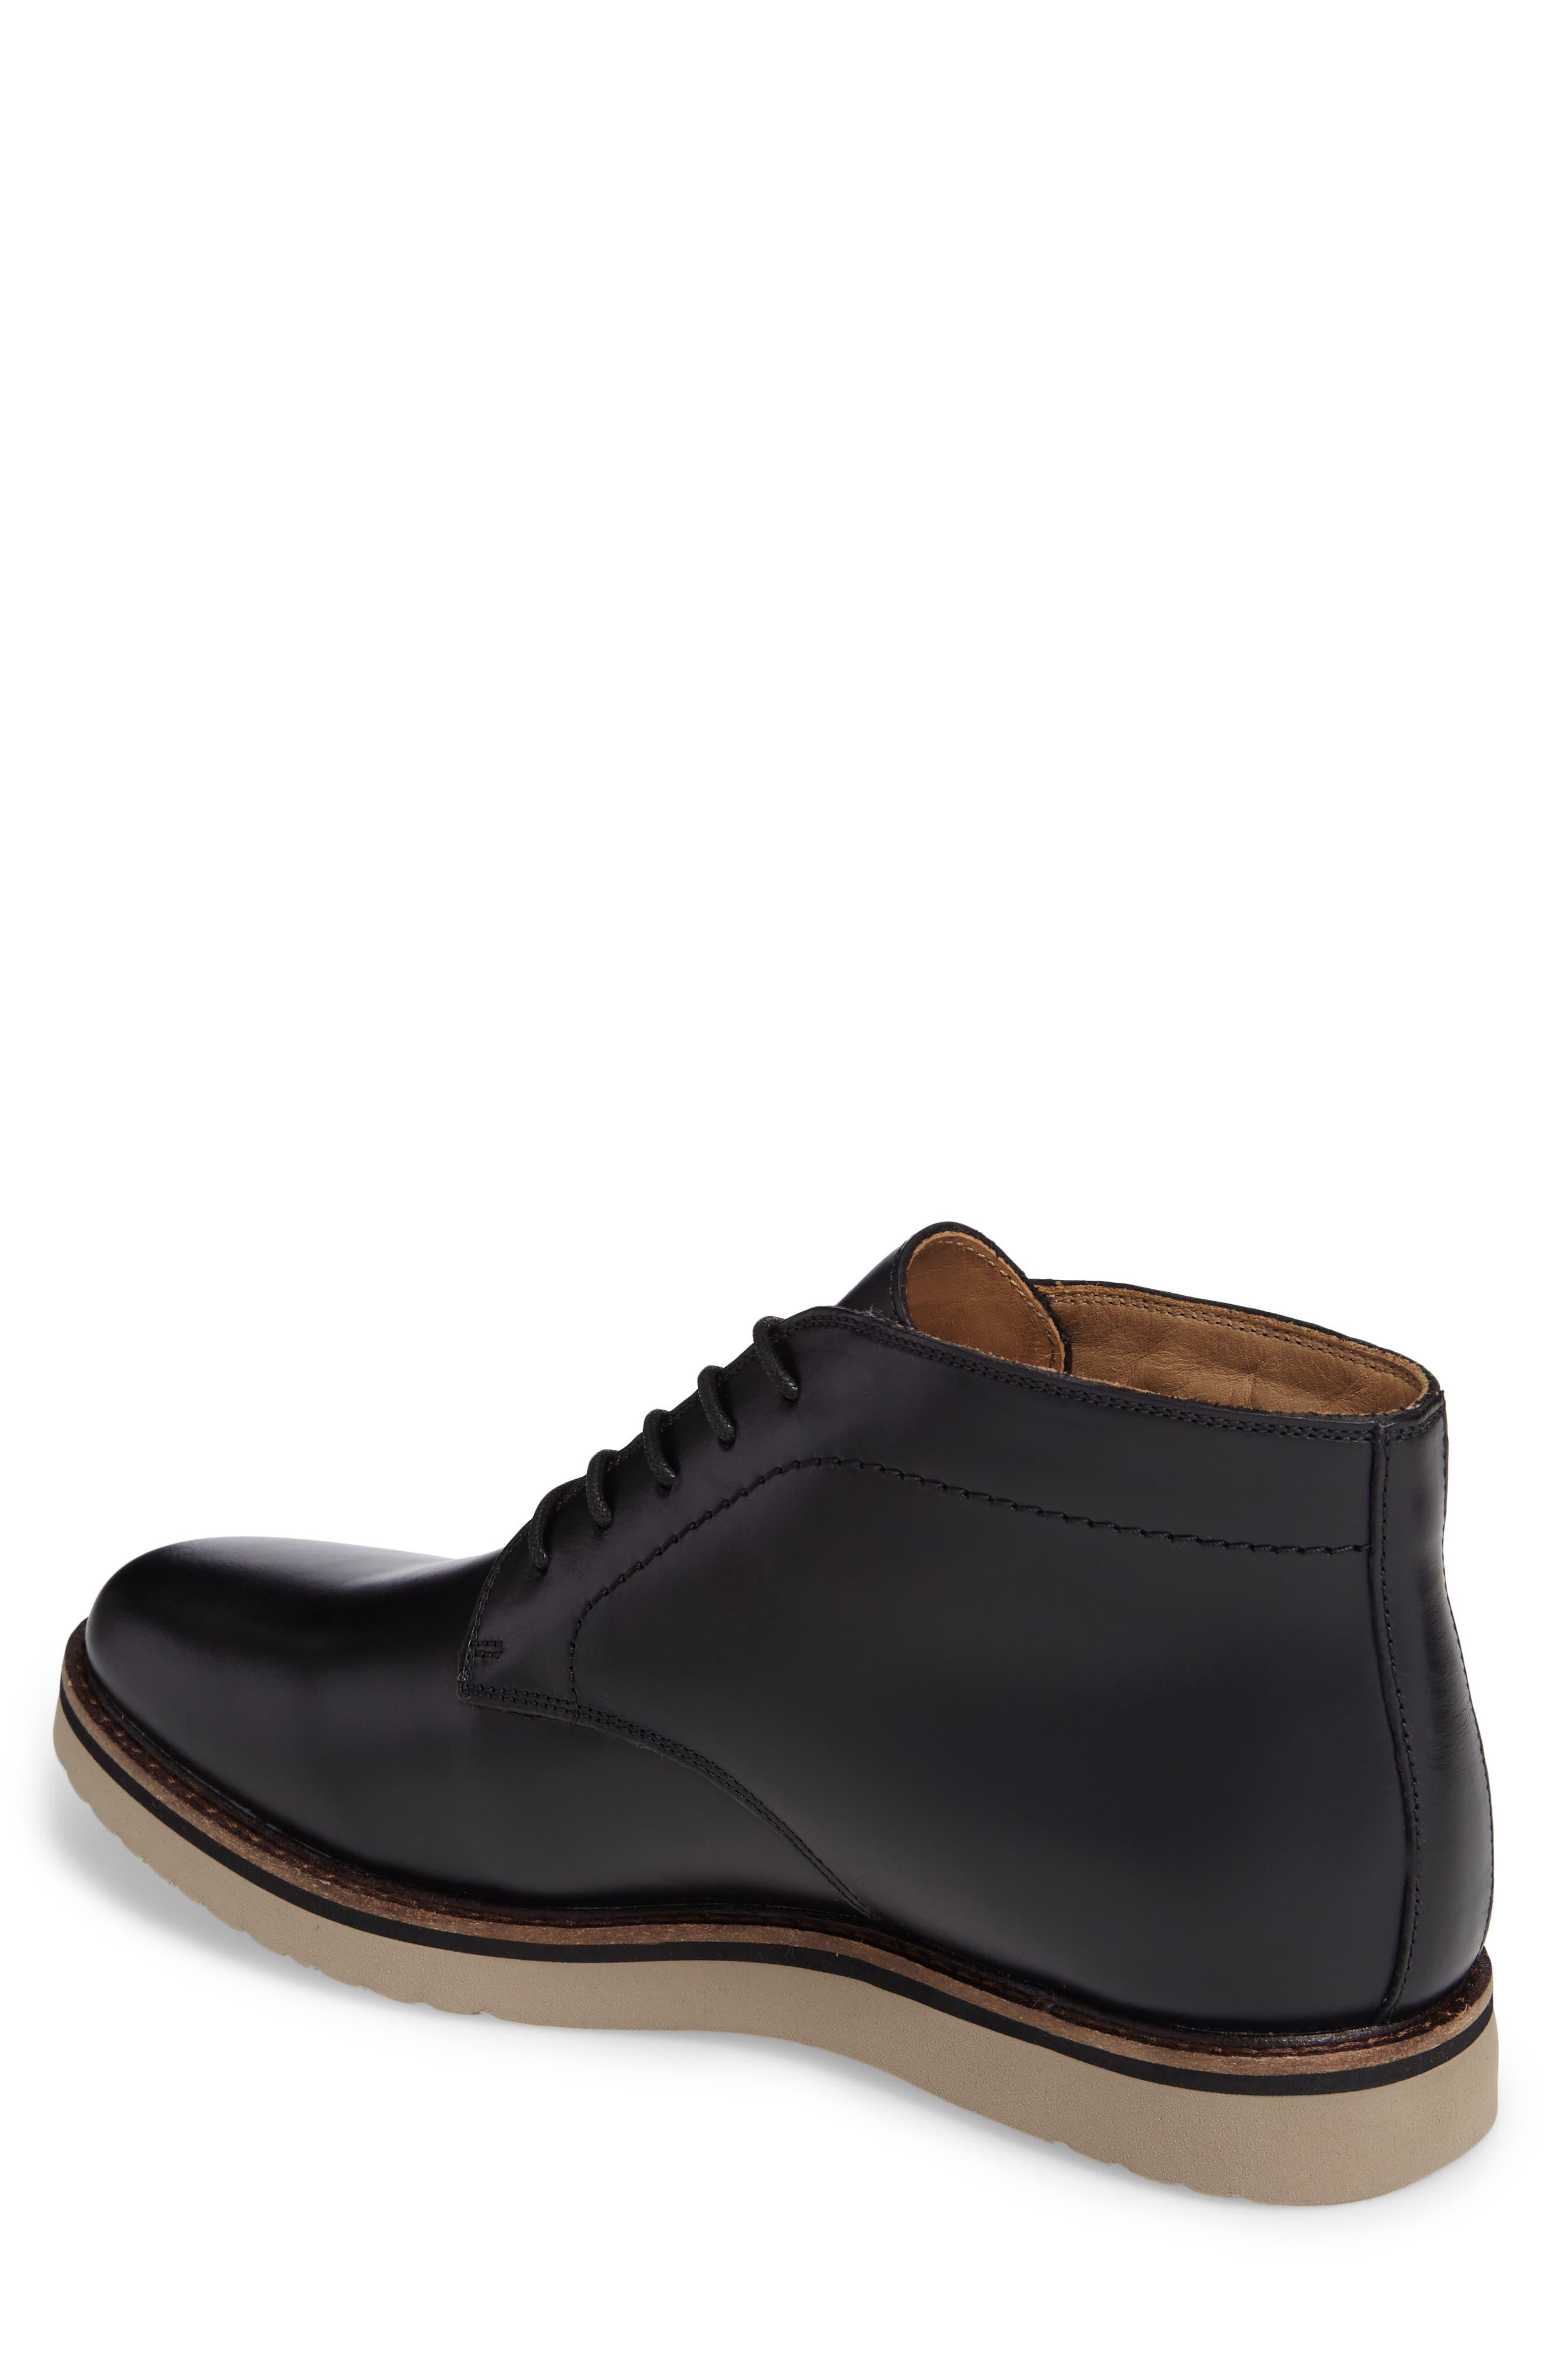 'Farley' Chukka Boot,                             Alternate thumbnail 2, color,                             Black/ Black Leather